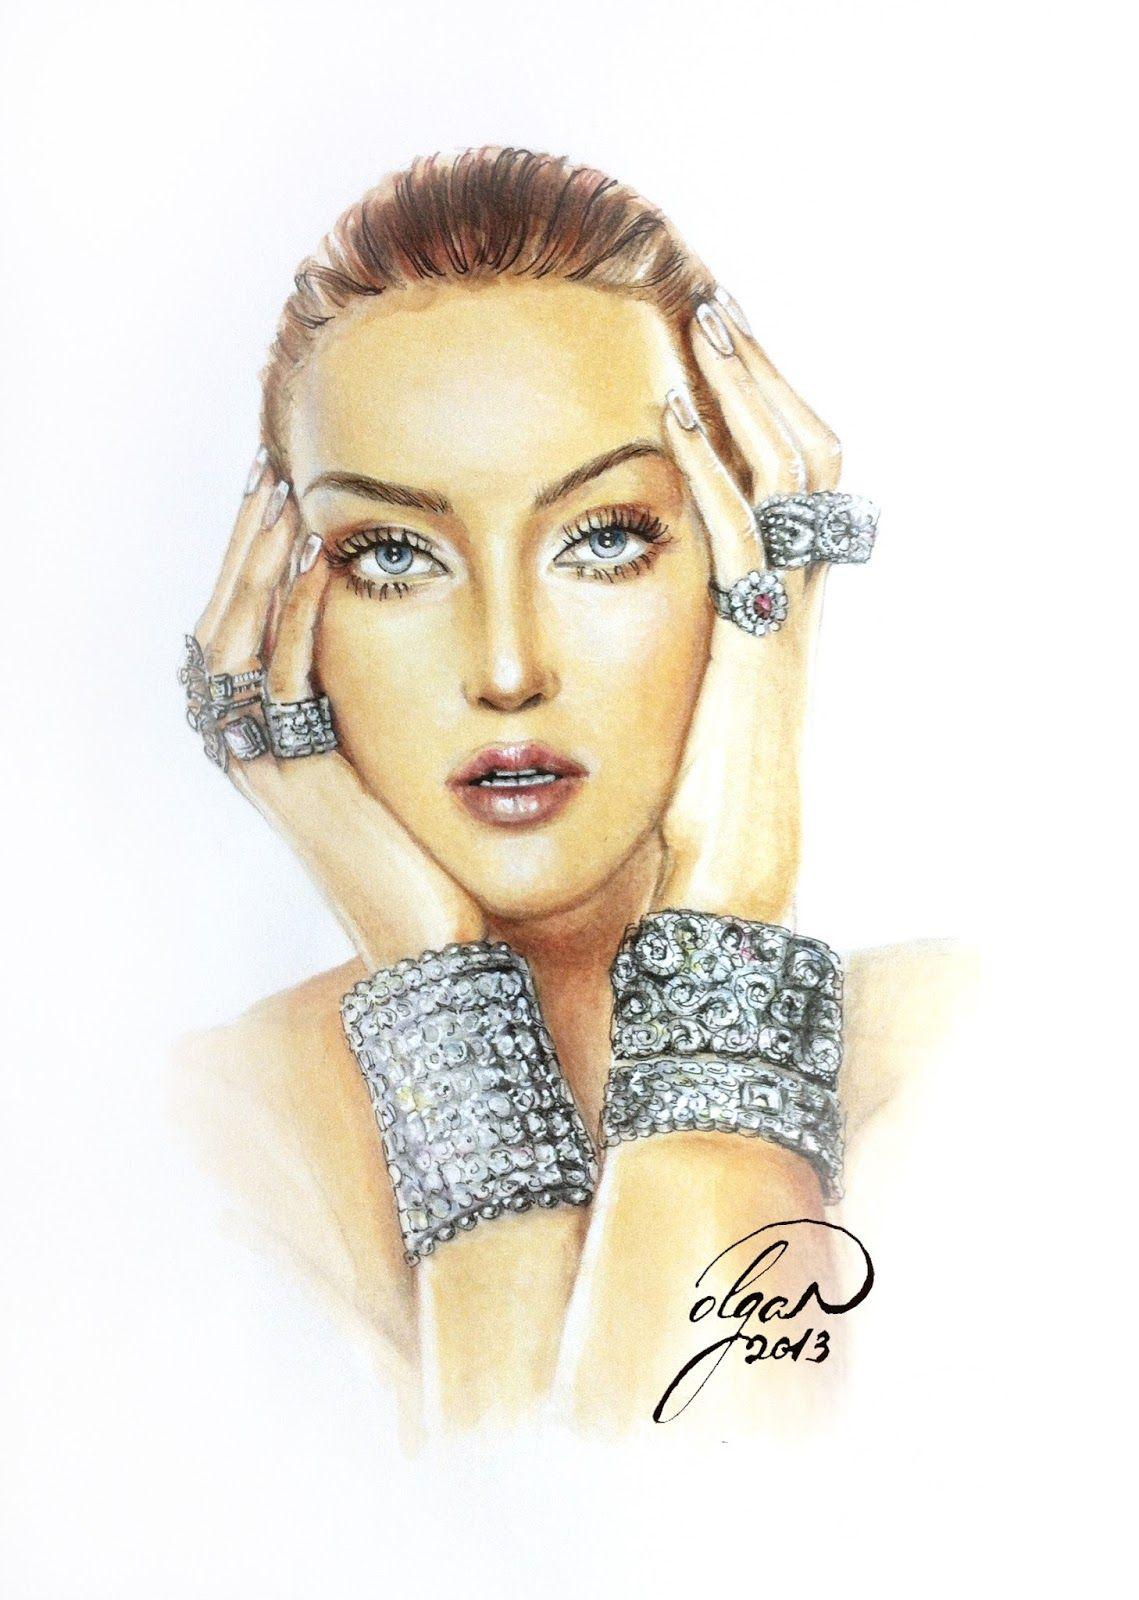 Lady in diamonds rings bracelet beautiful eyes fashion illustration beautiful face model Olga Dvoryanskaya copic markers